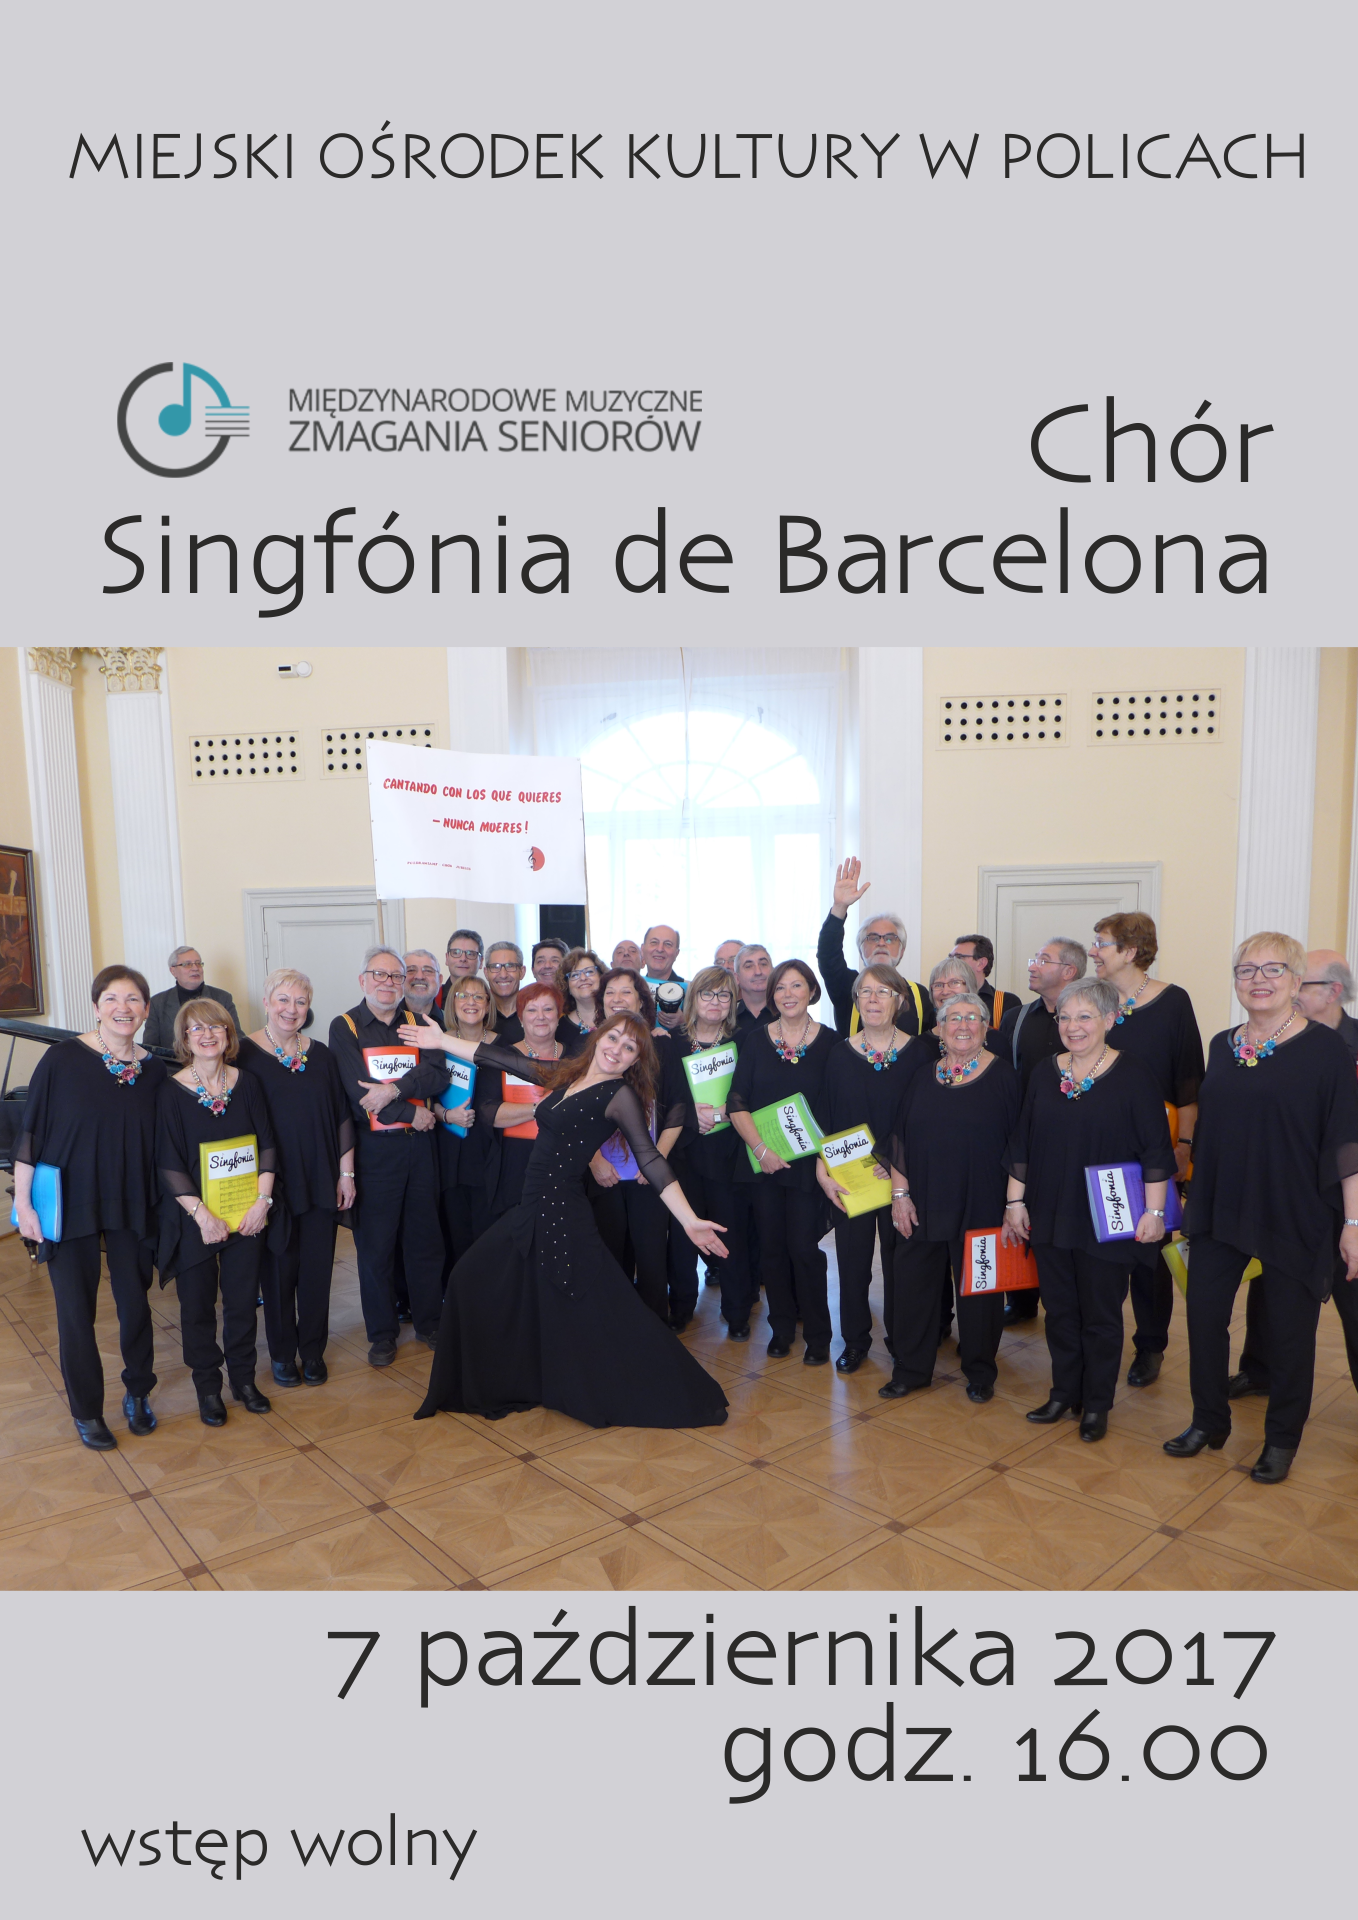 Koncert Chóru Singfónia de Barcelona z Hiszpanii